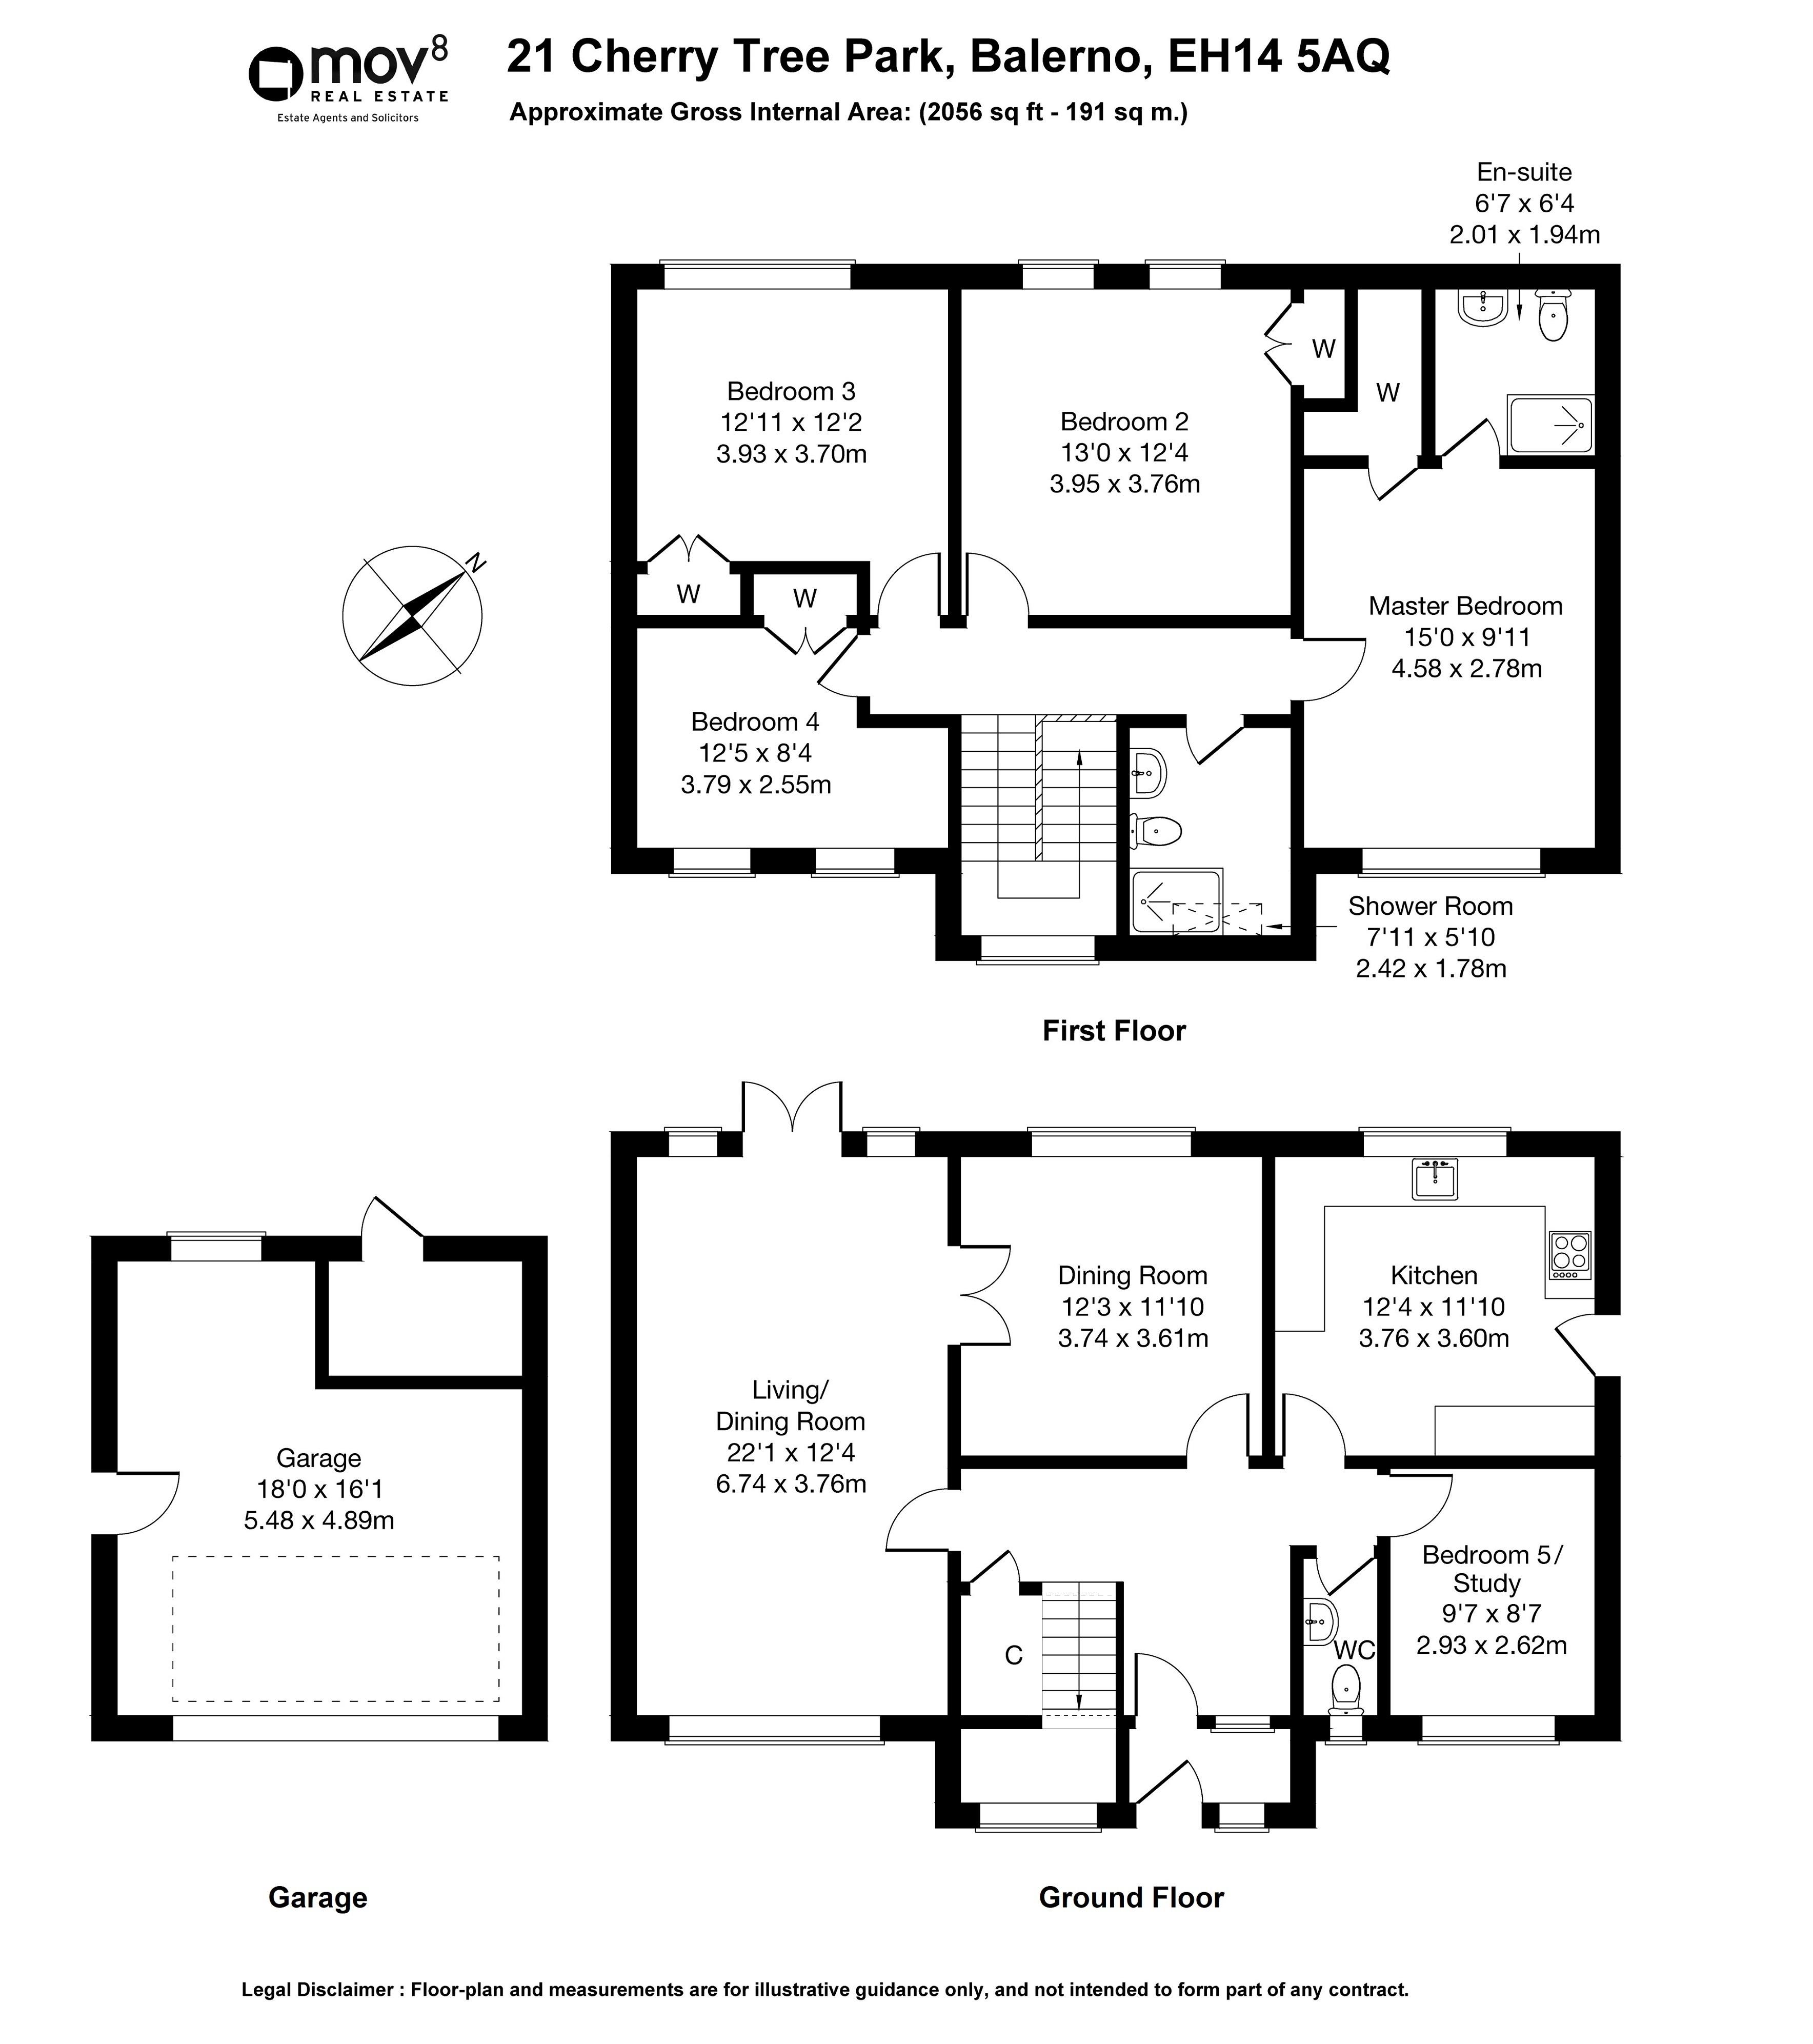 Floorplan 1 of  21 Cherry Tree Park, Balerno, City of Edinburgh, EH14 5AQ